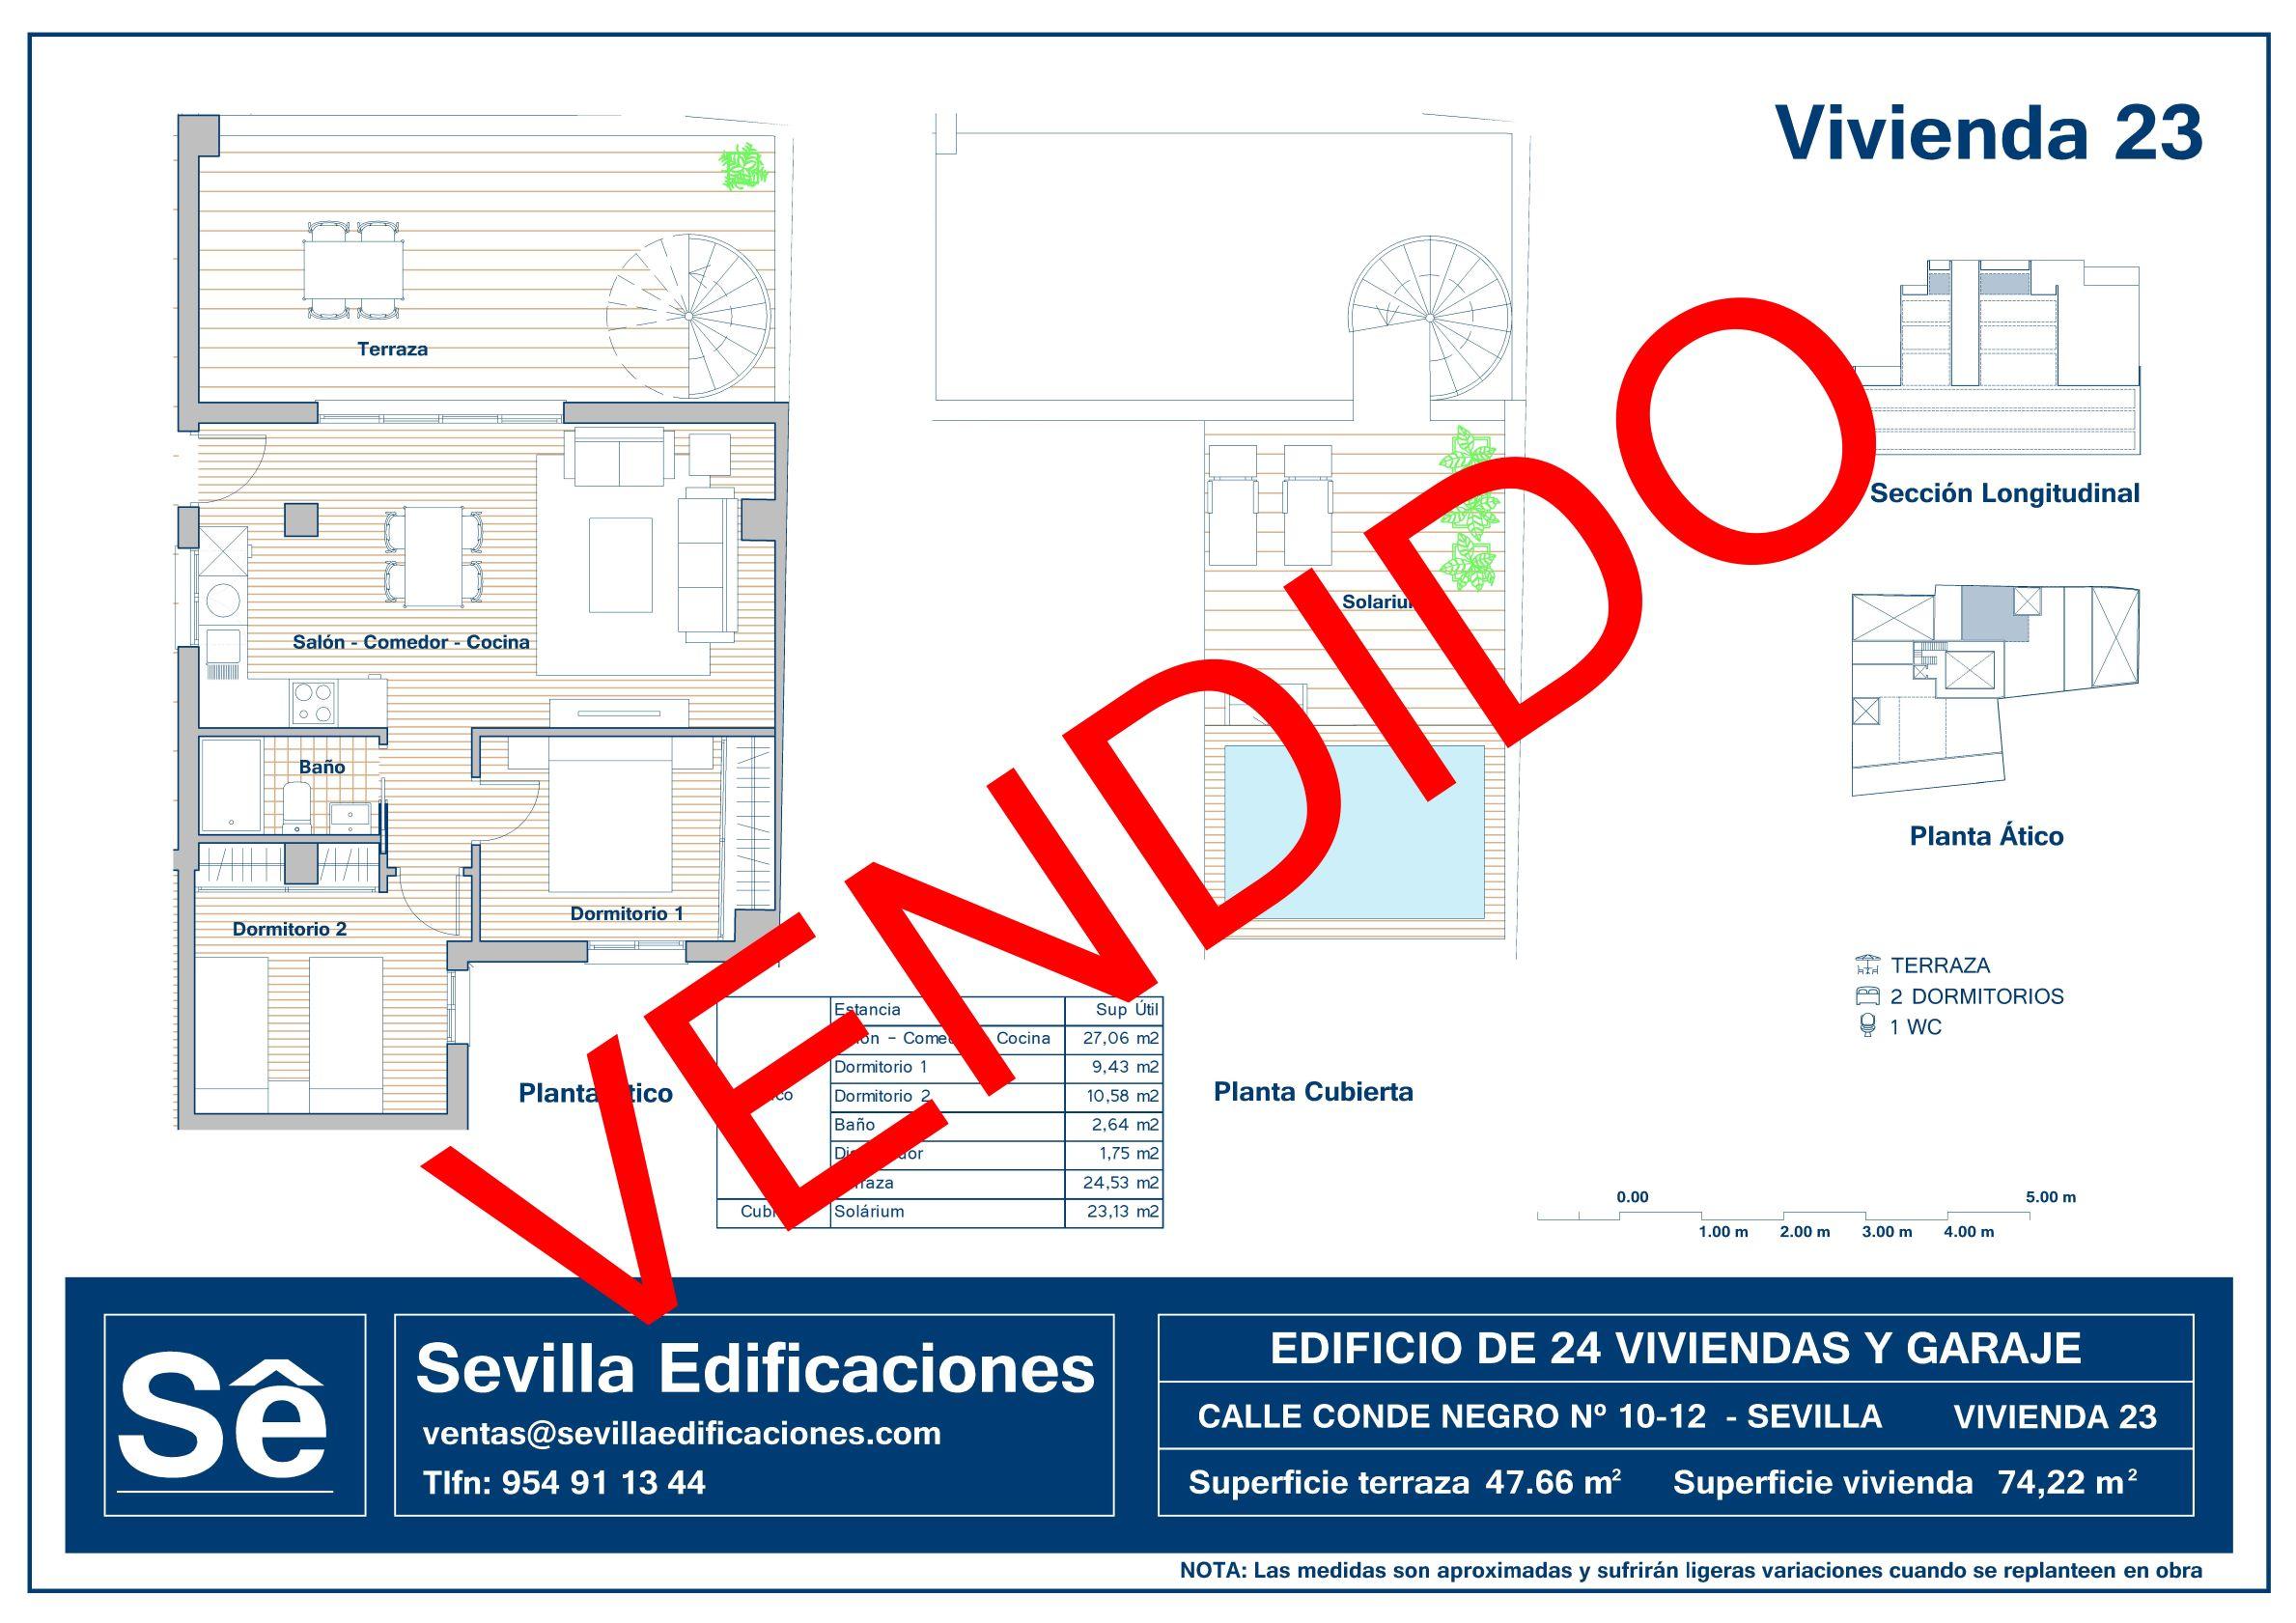 CONDENEGRO_VIVIENDA_23_VENDIDO